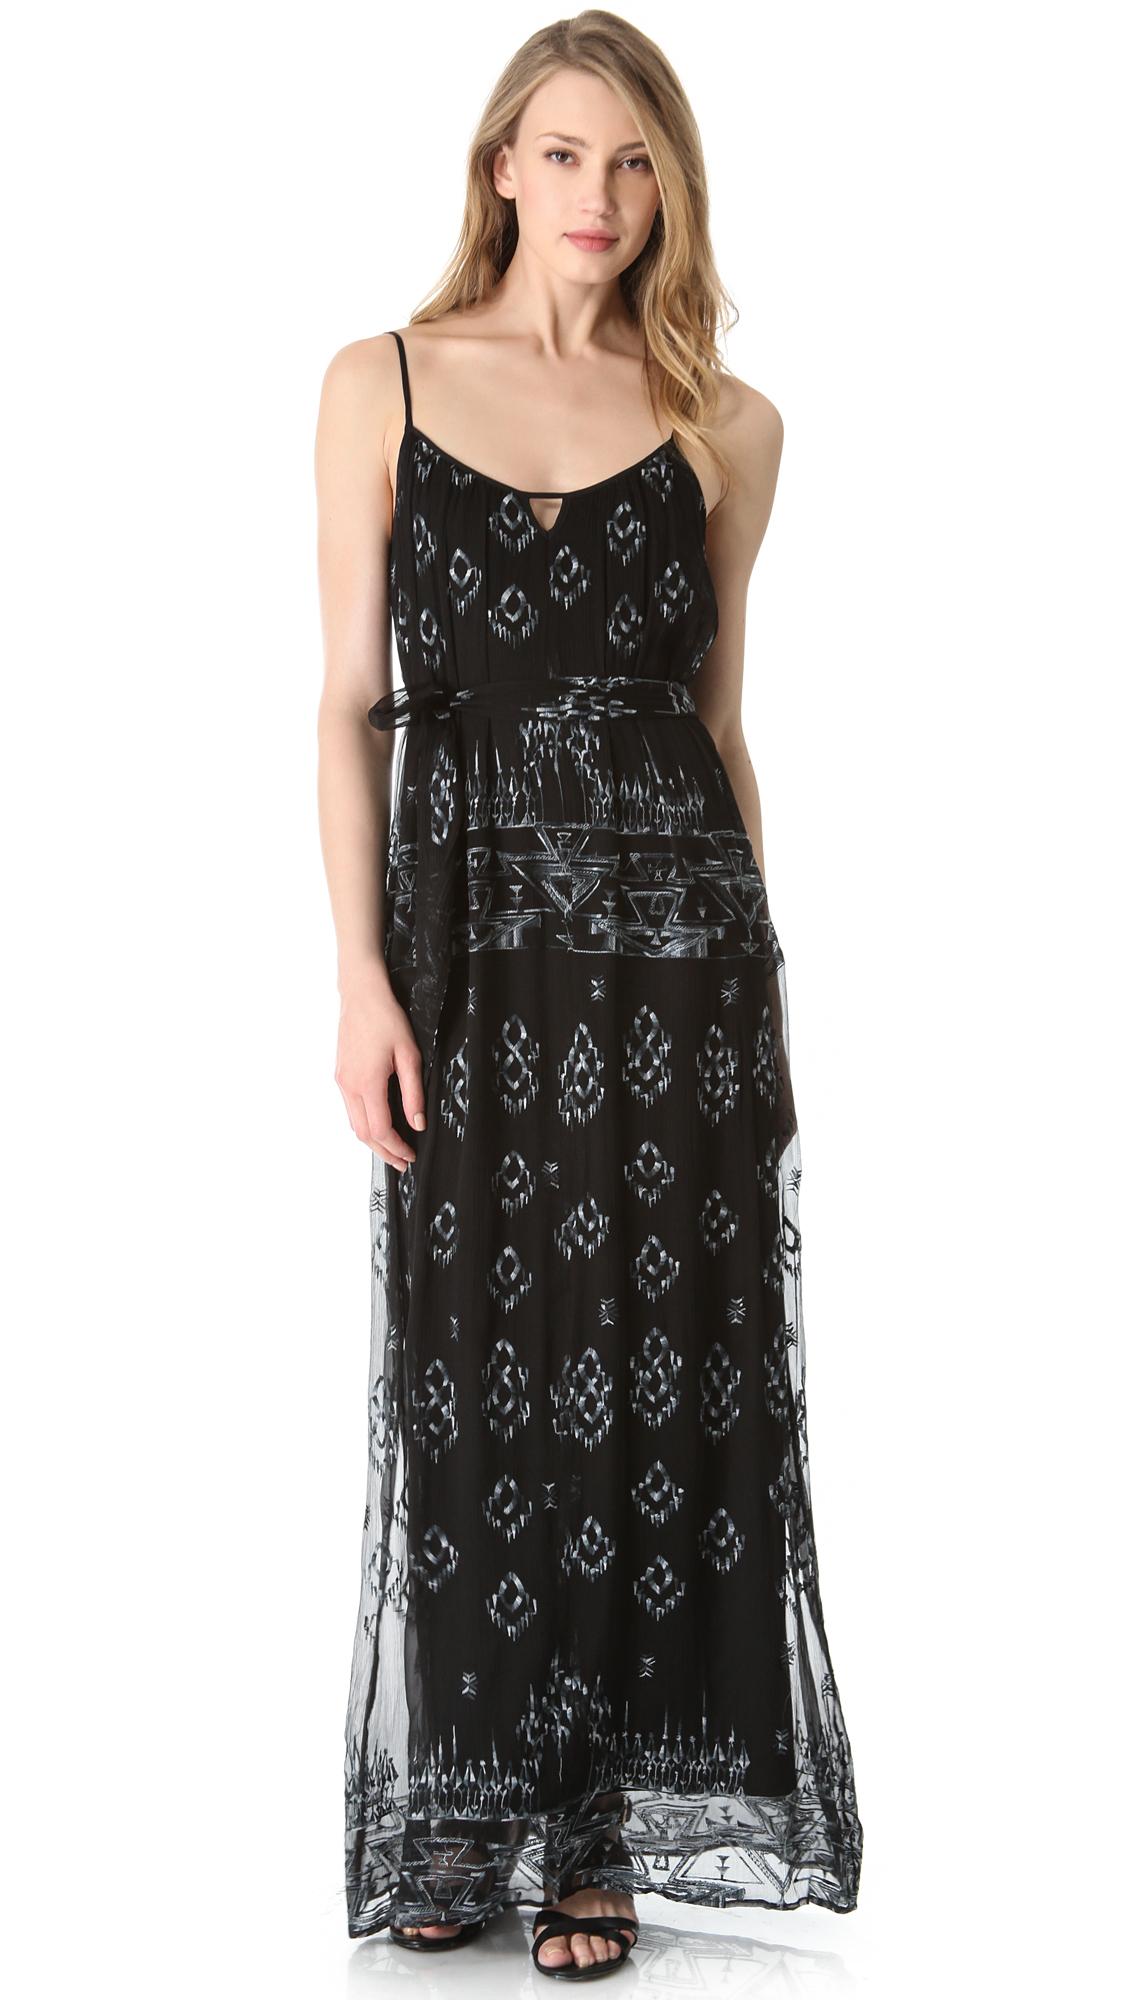 Twelfth street by cynthia vincent black maxi dress